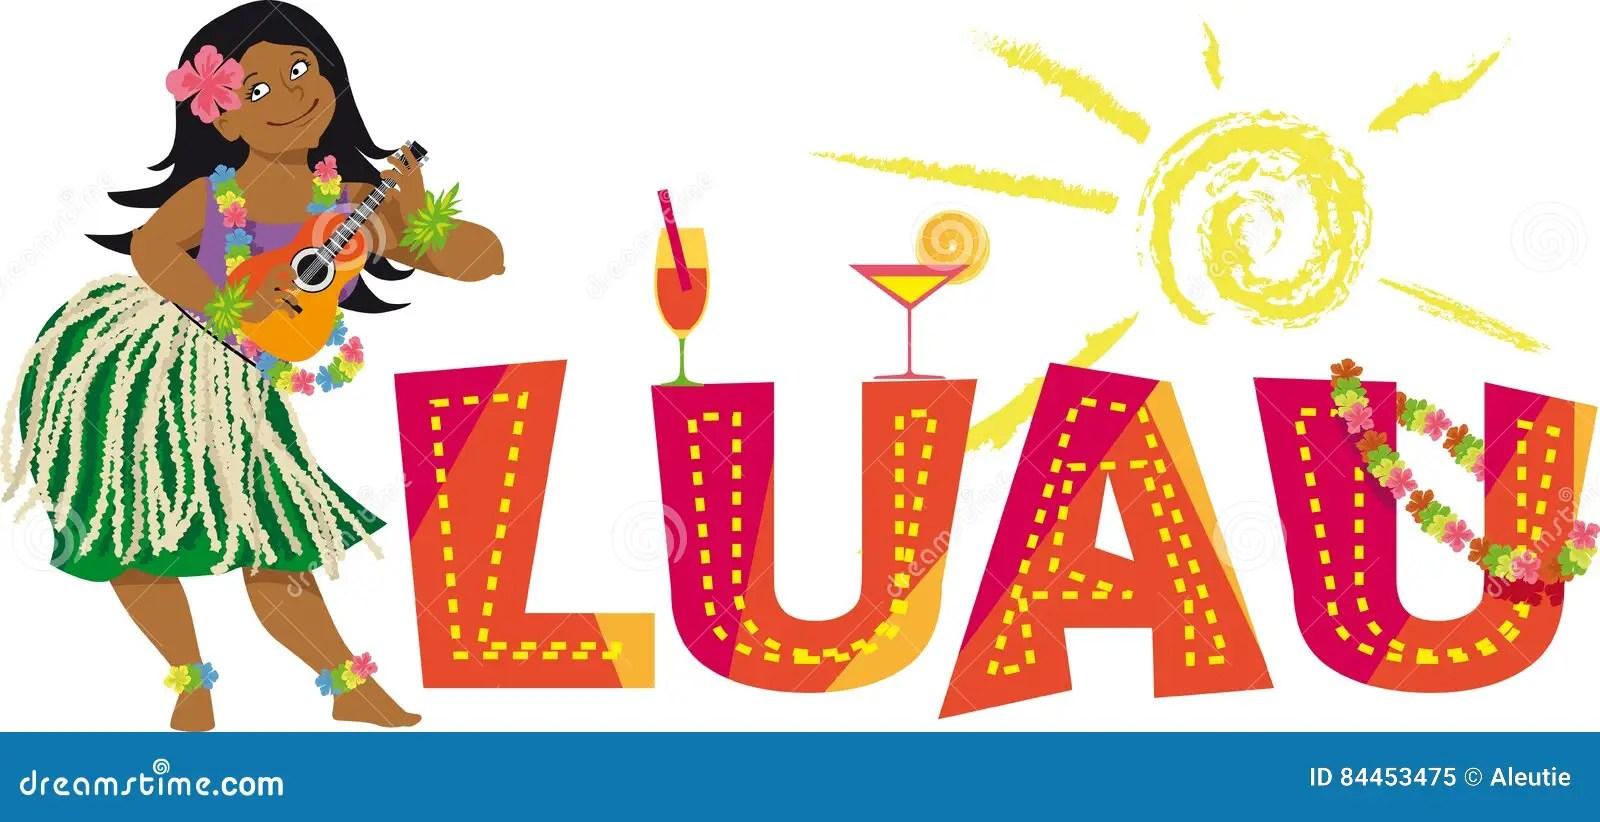 hight resolution of luau stock illustrations 1 976 luau stock illustrations vectors clipart dreamstime